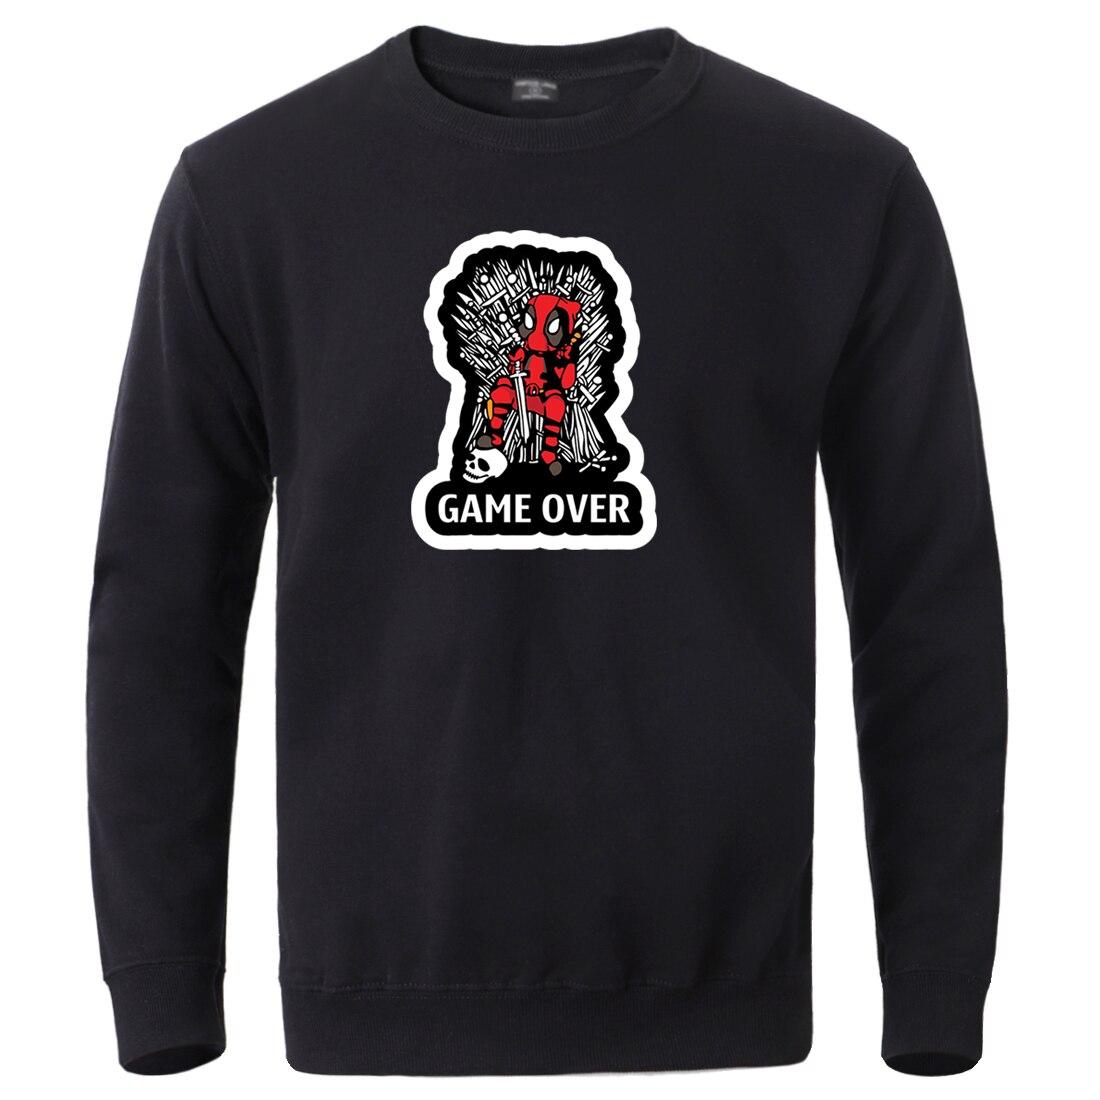 Marvel Deadpool Mens Winter Fleece Sweatshirt 2020 Hot Sale Round Neck Streetwear Hoodie Long Sleeve Work Out Tracksuit Pullover